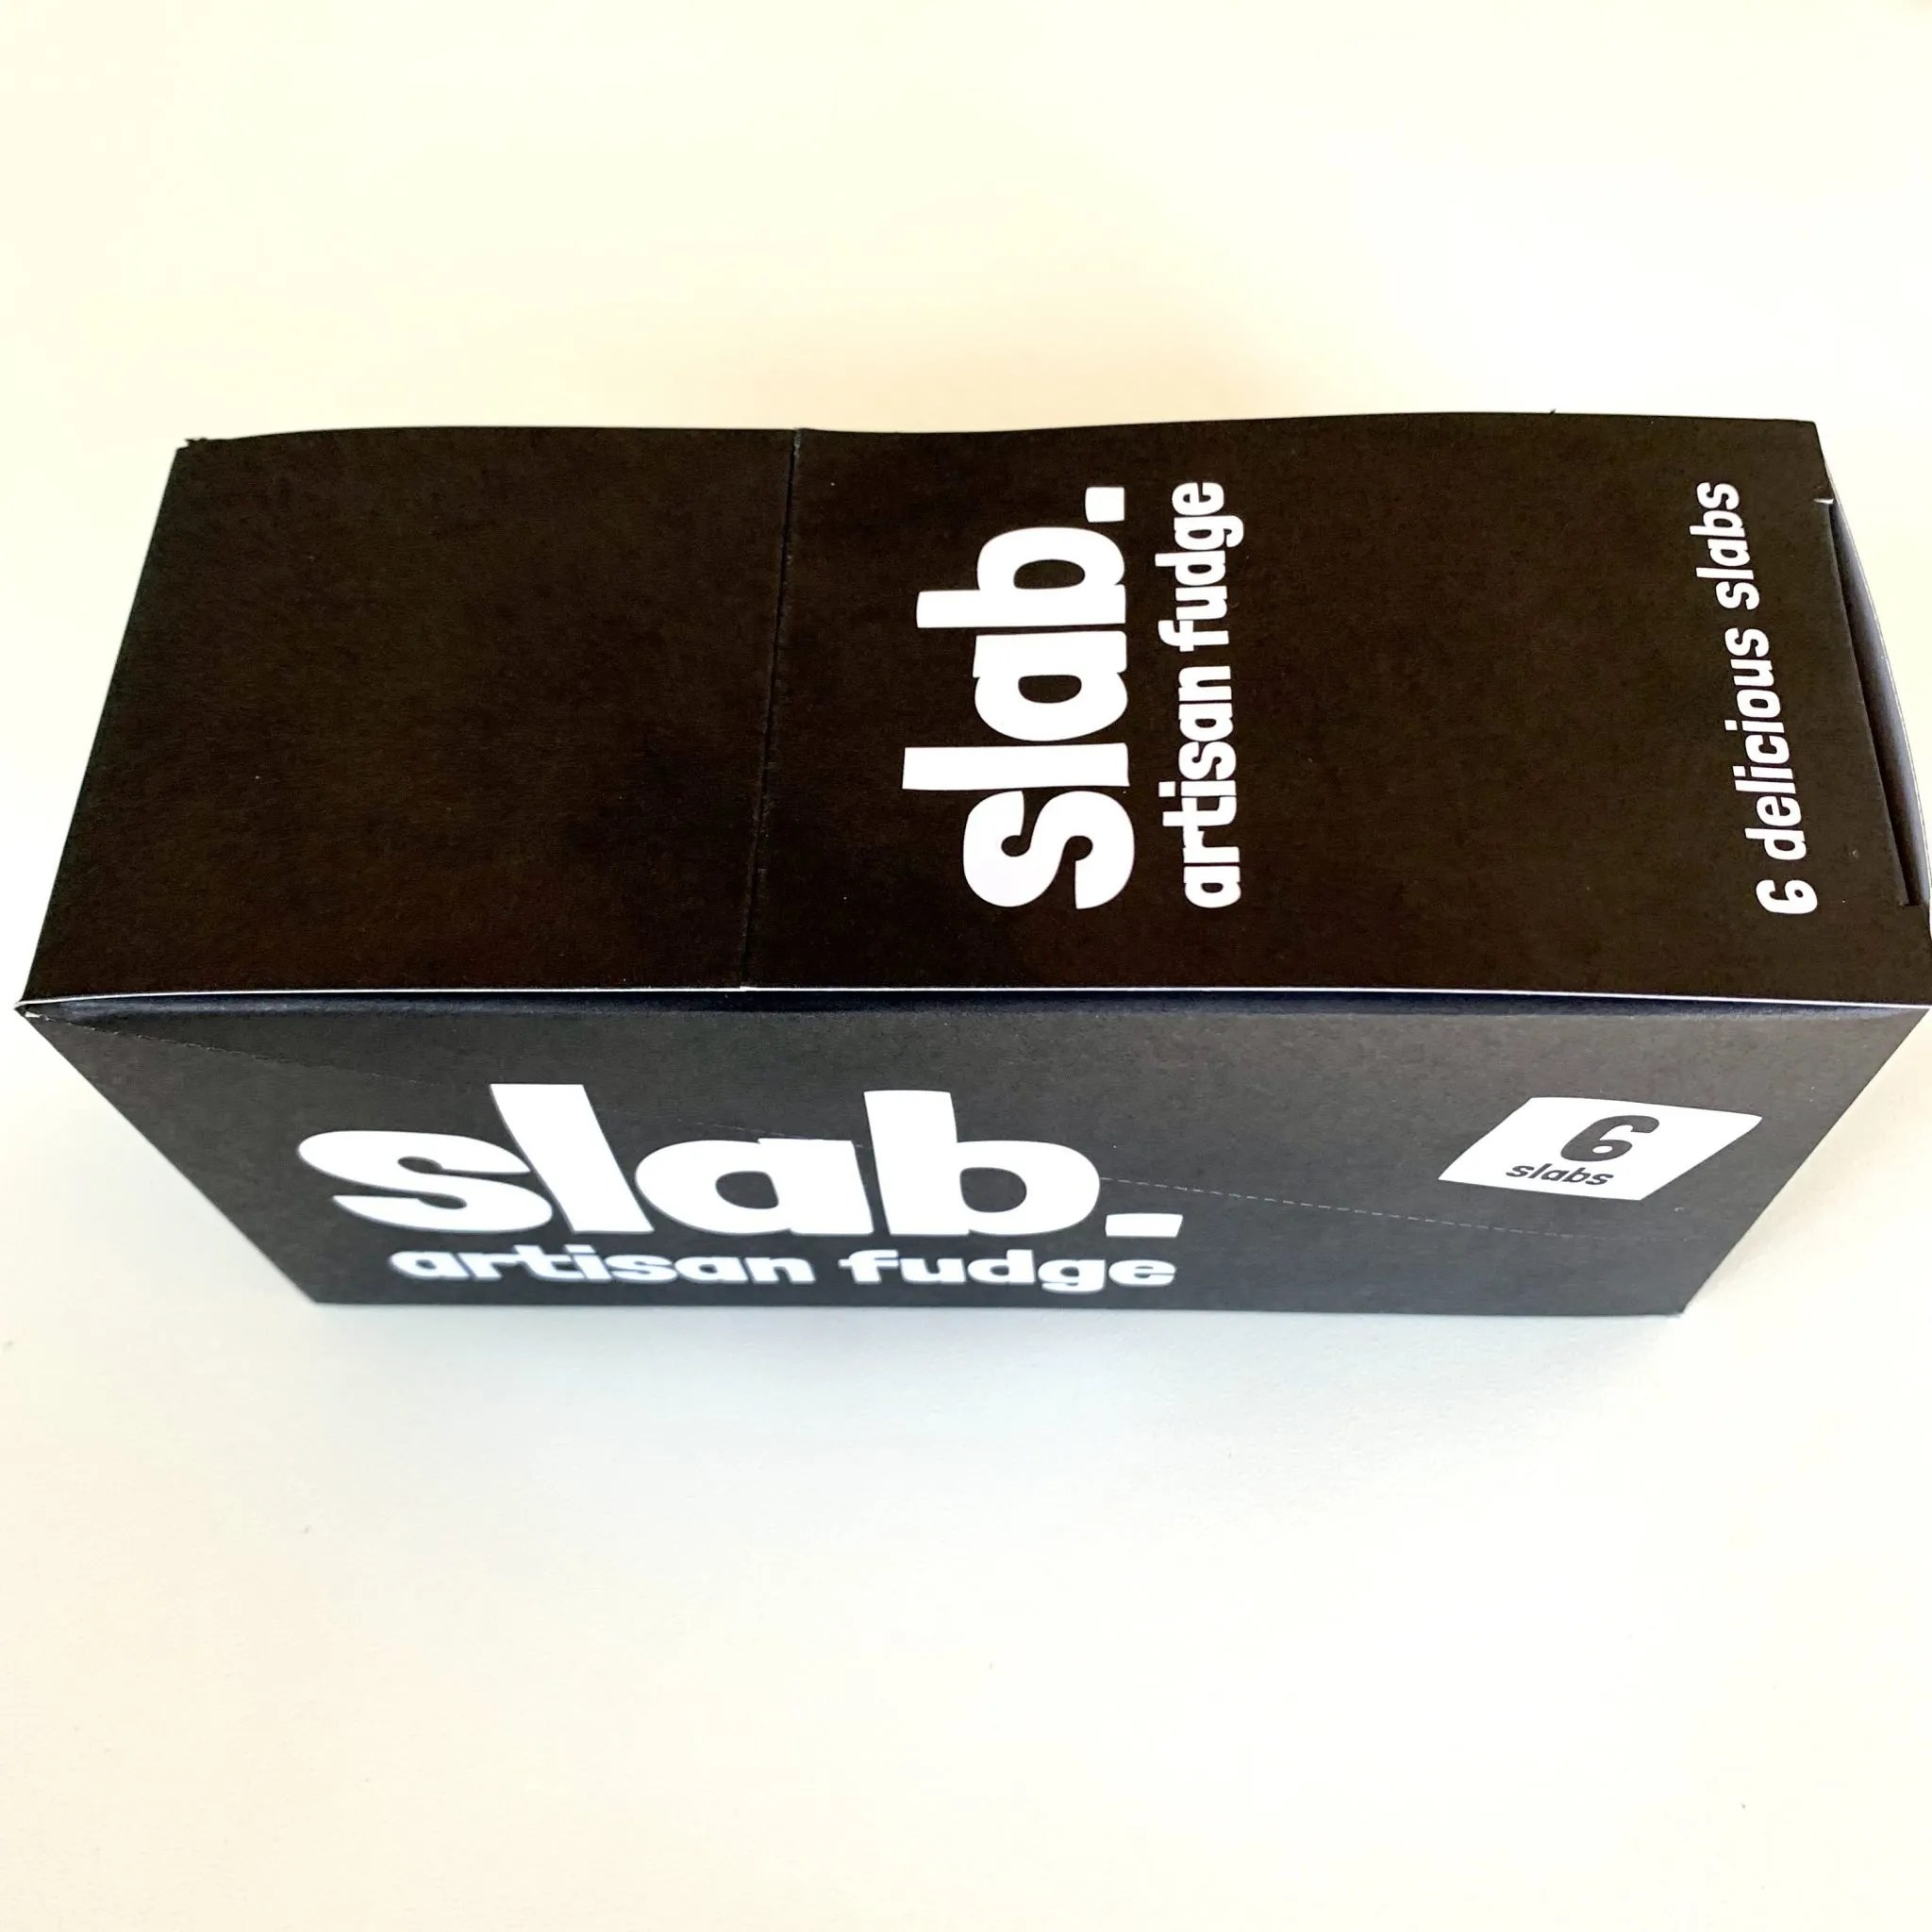 Slab Wholesale Case - Dairy 5